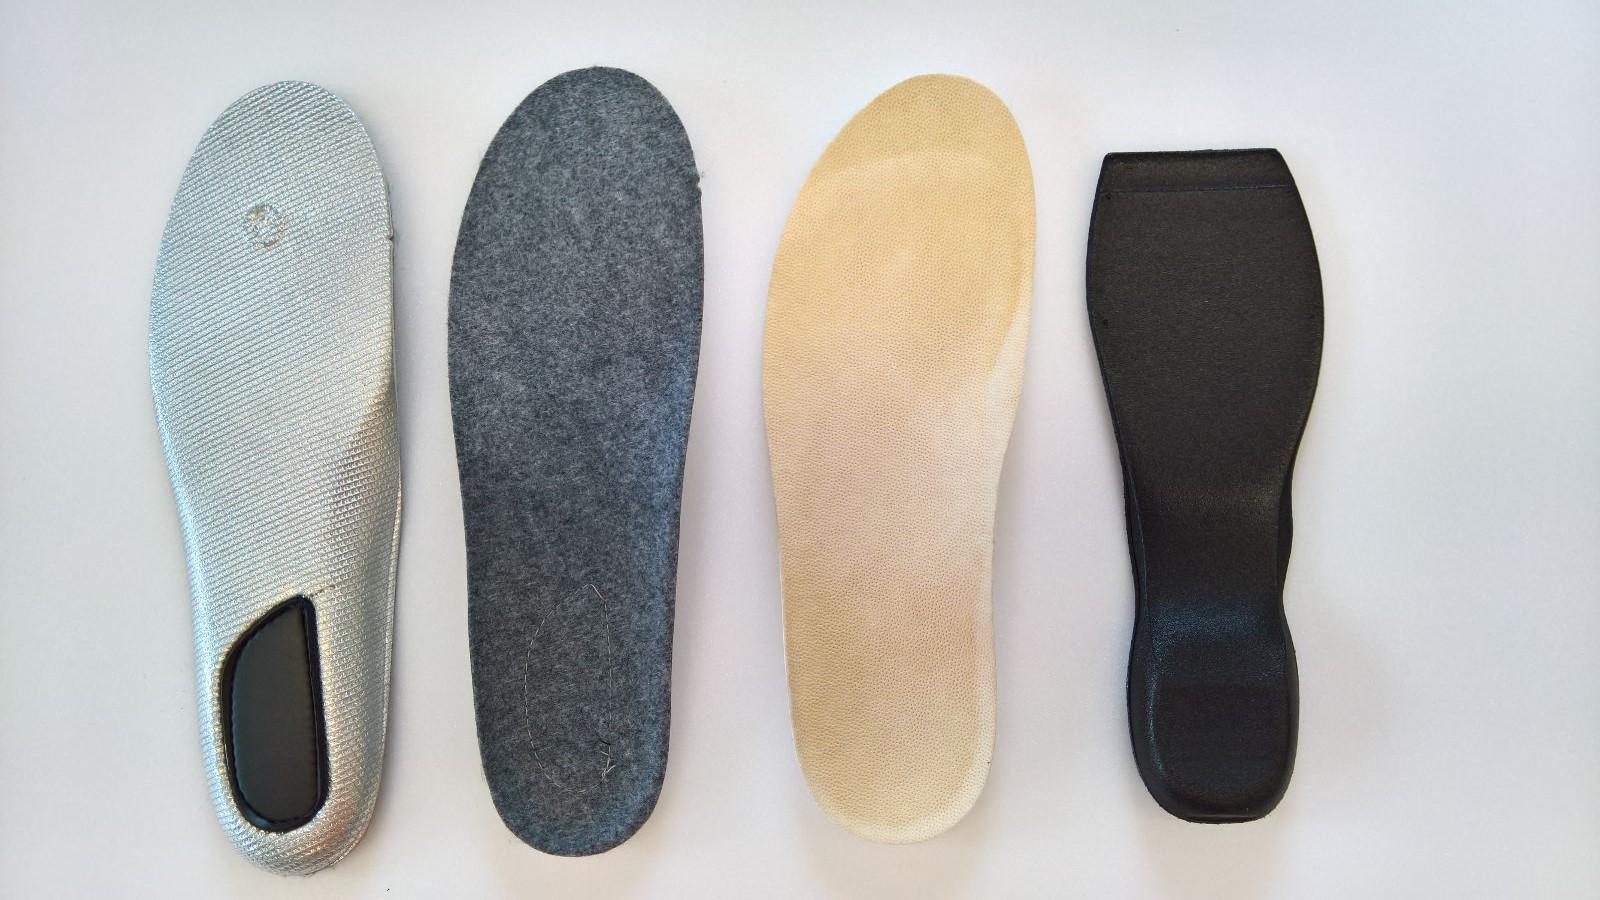 Sottopiedi calzature Teamform